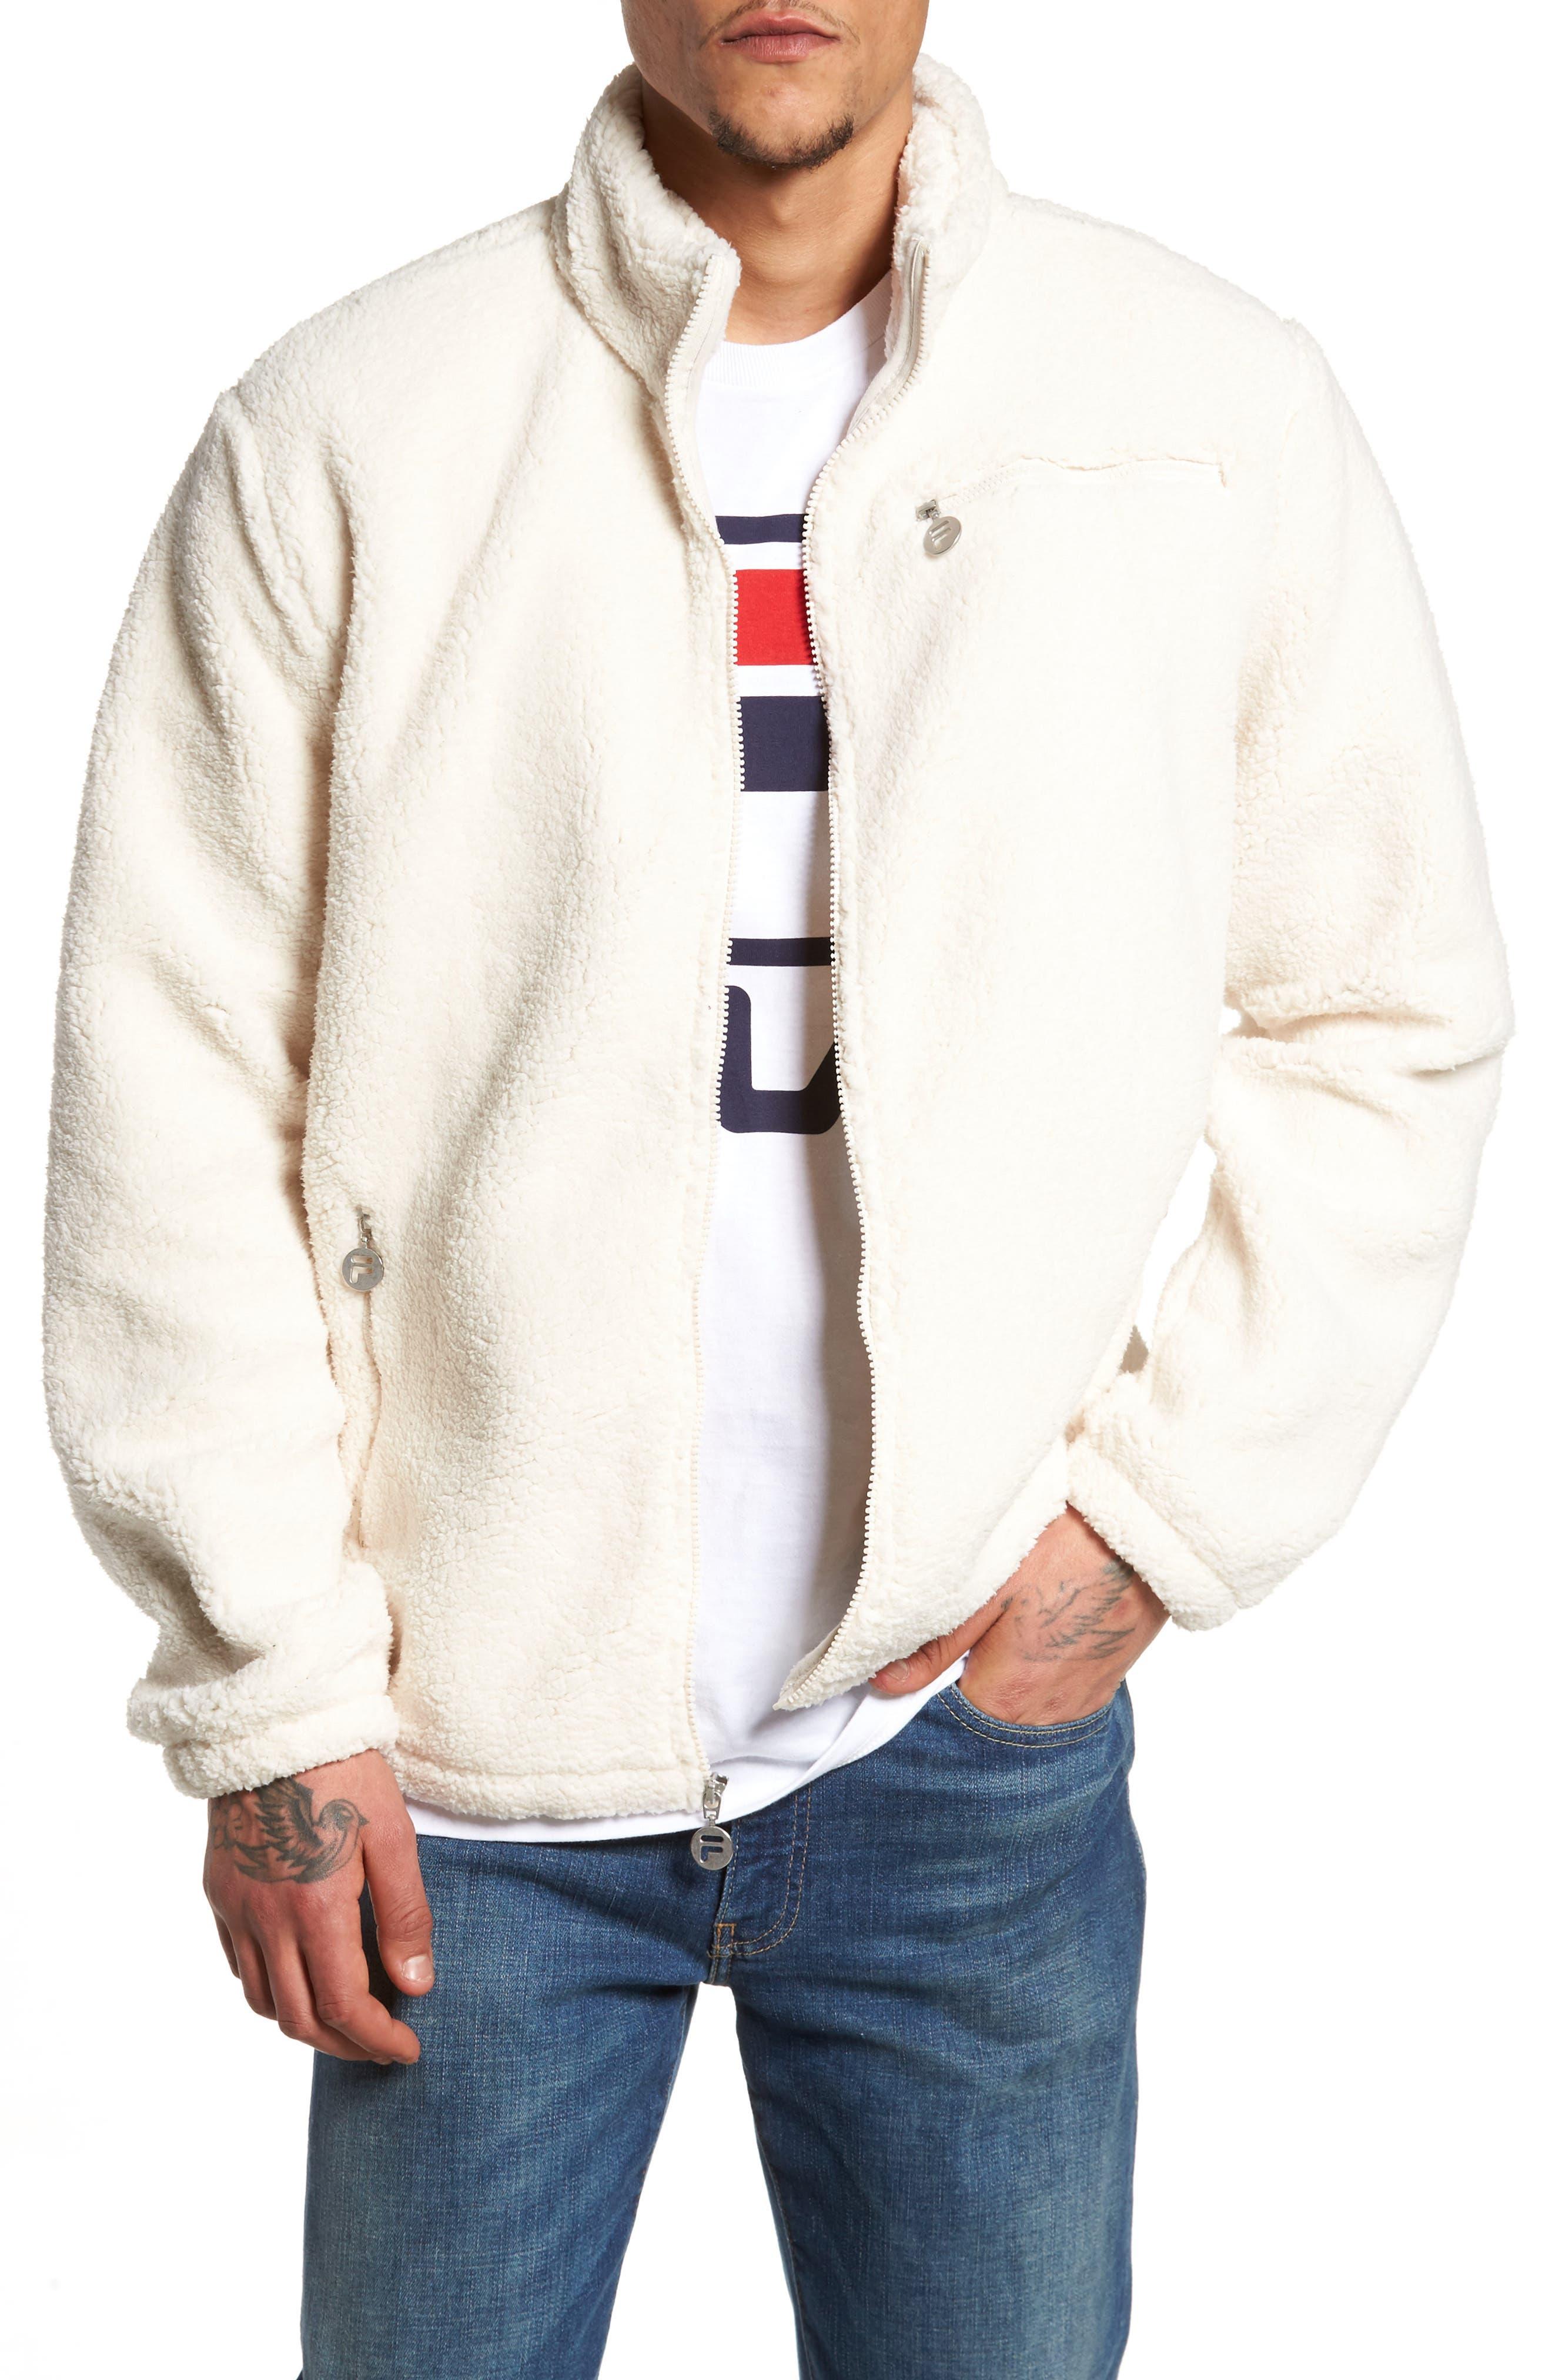 Finlay Fleece Jacket,                             Main thumbnail 1, color,                             250